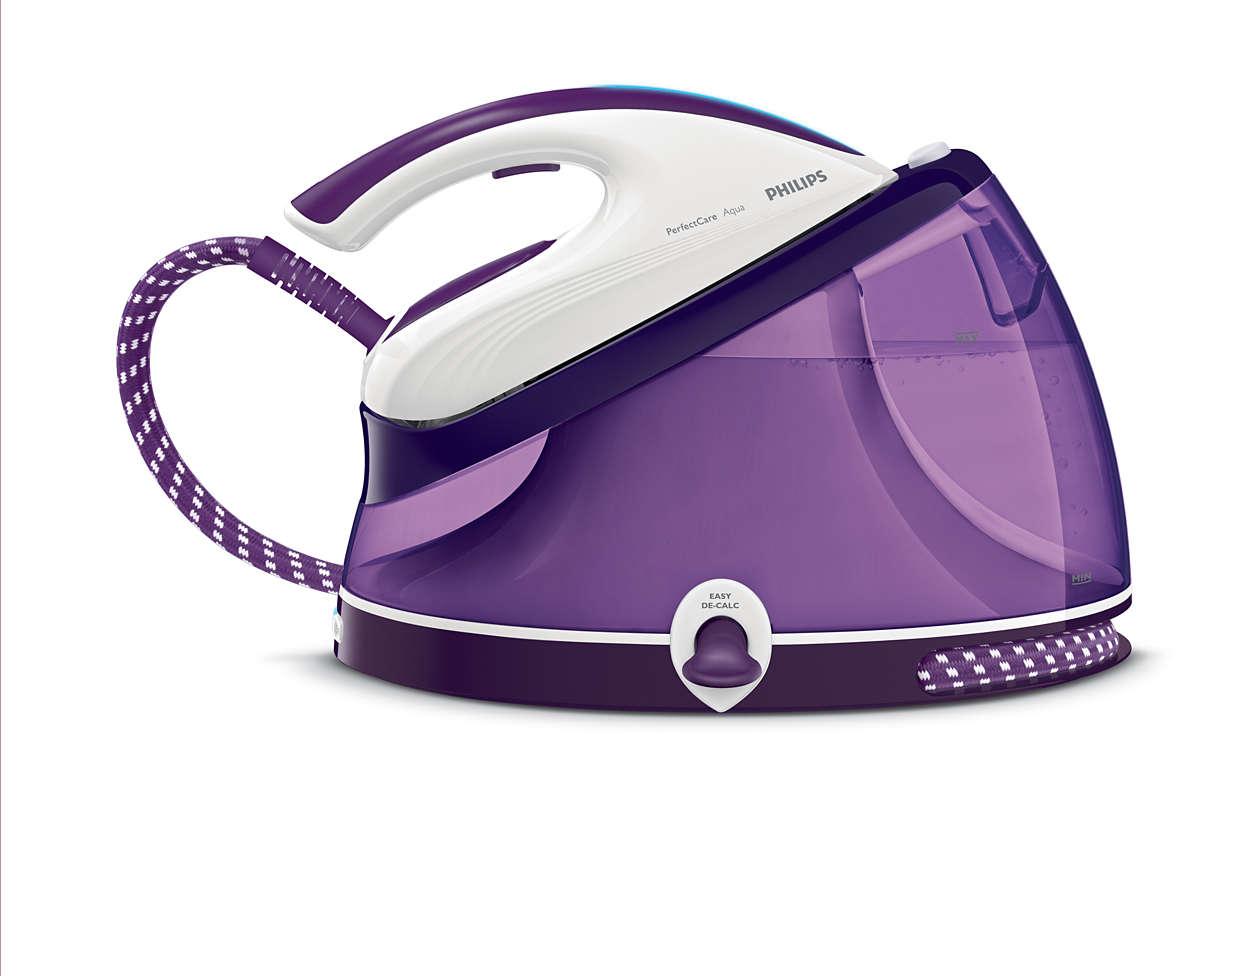 Ultra fast ironing